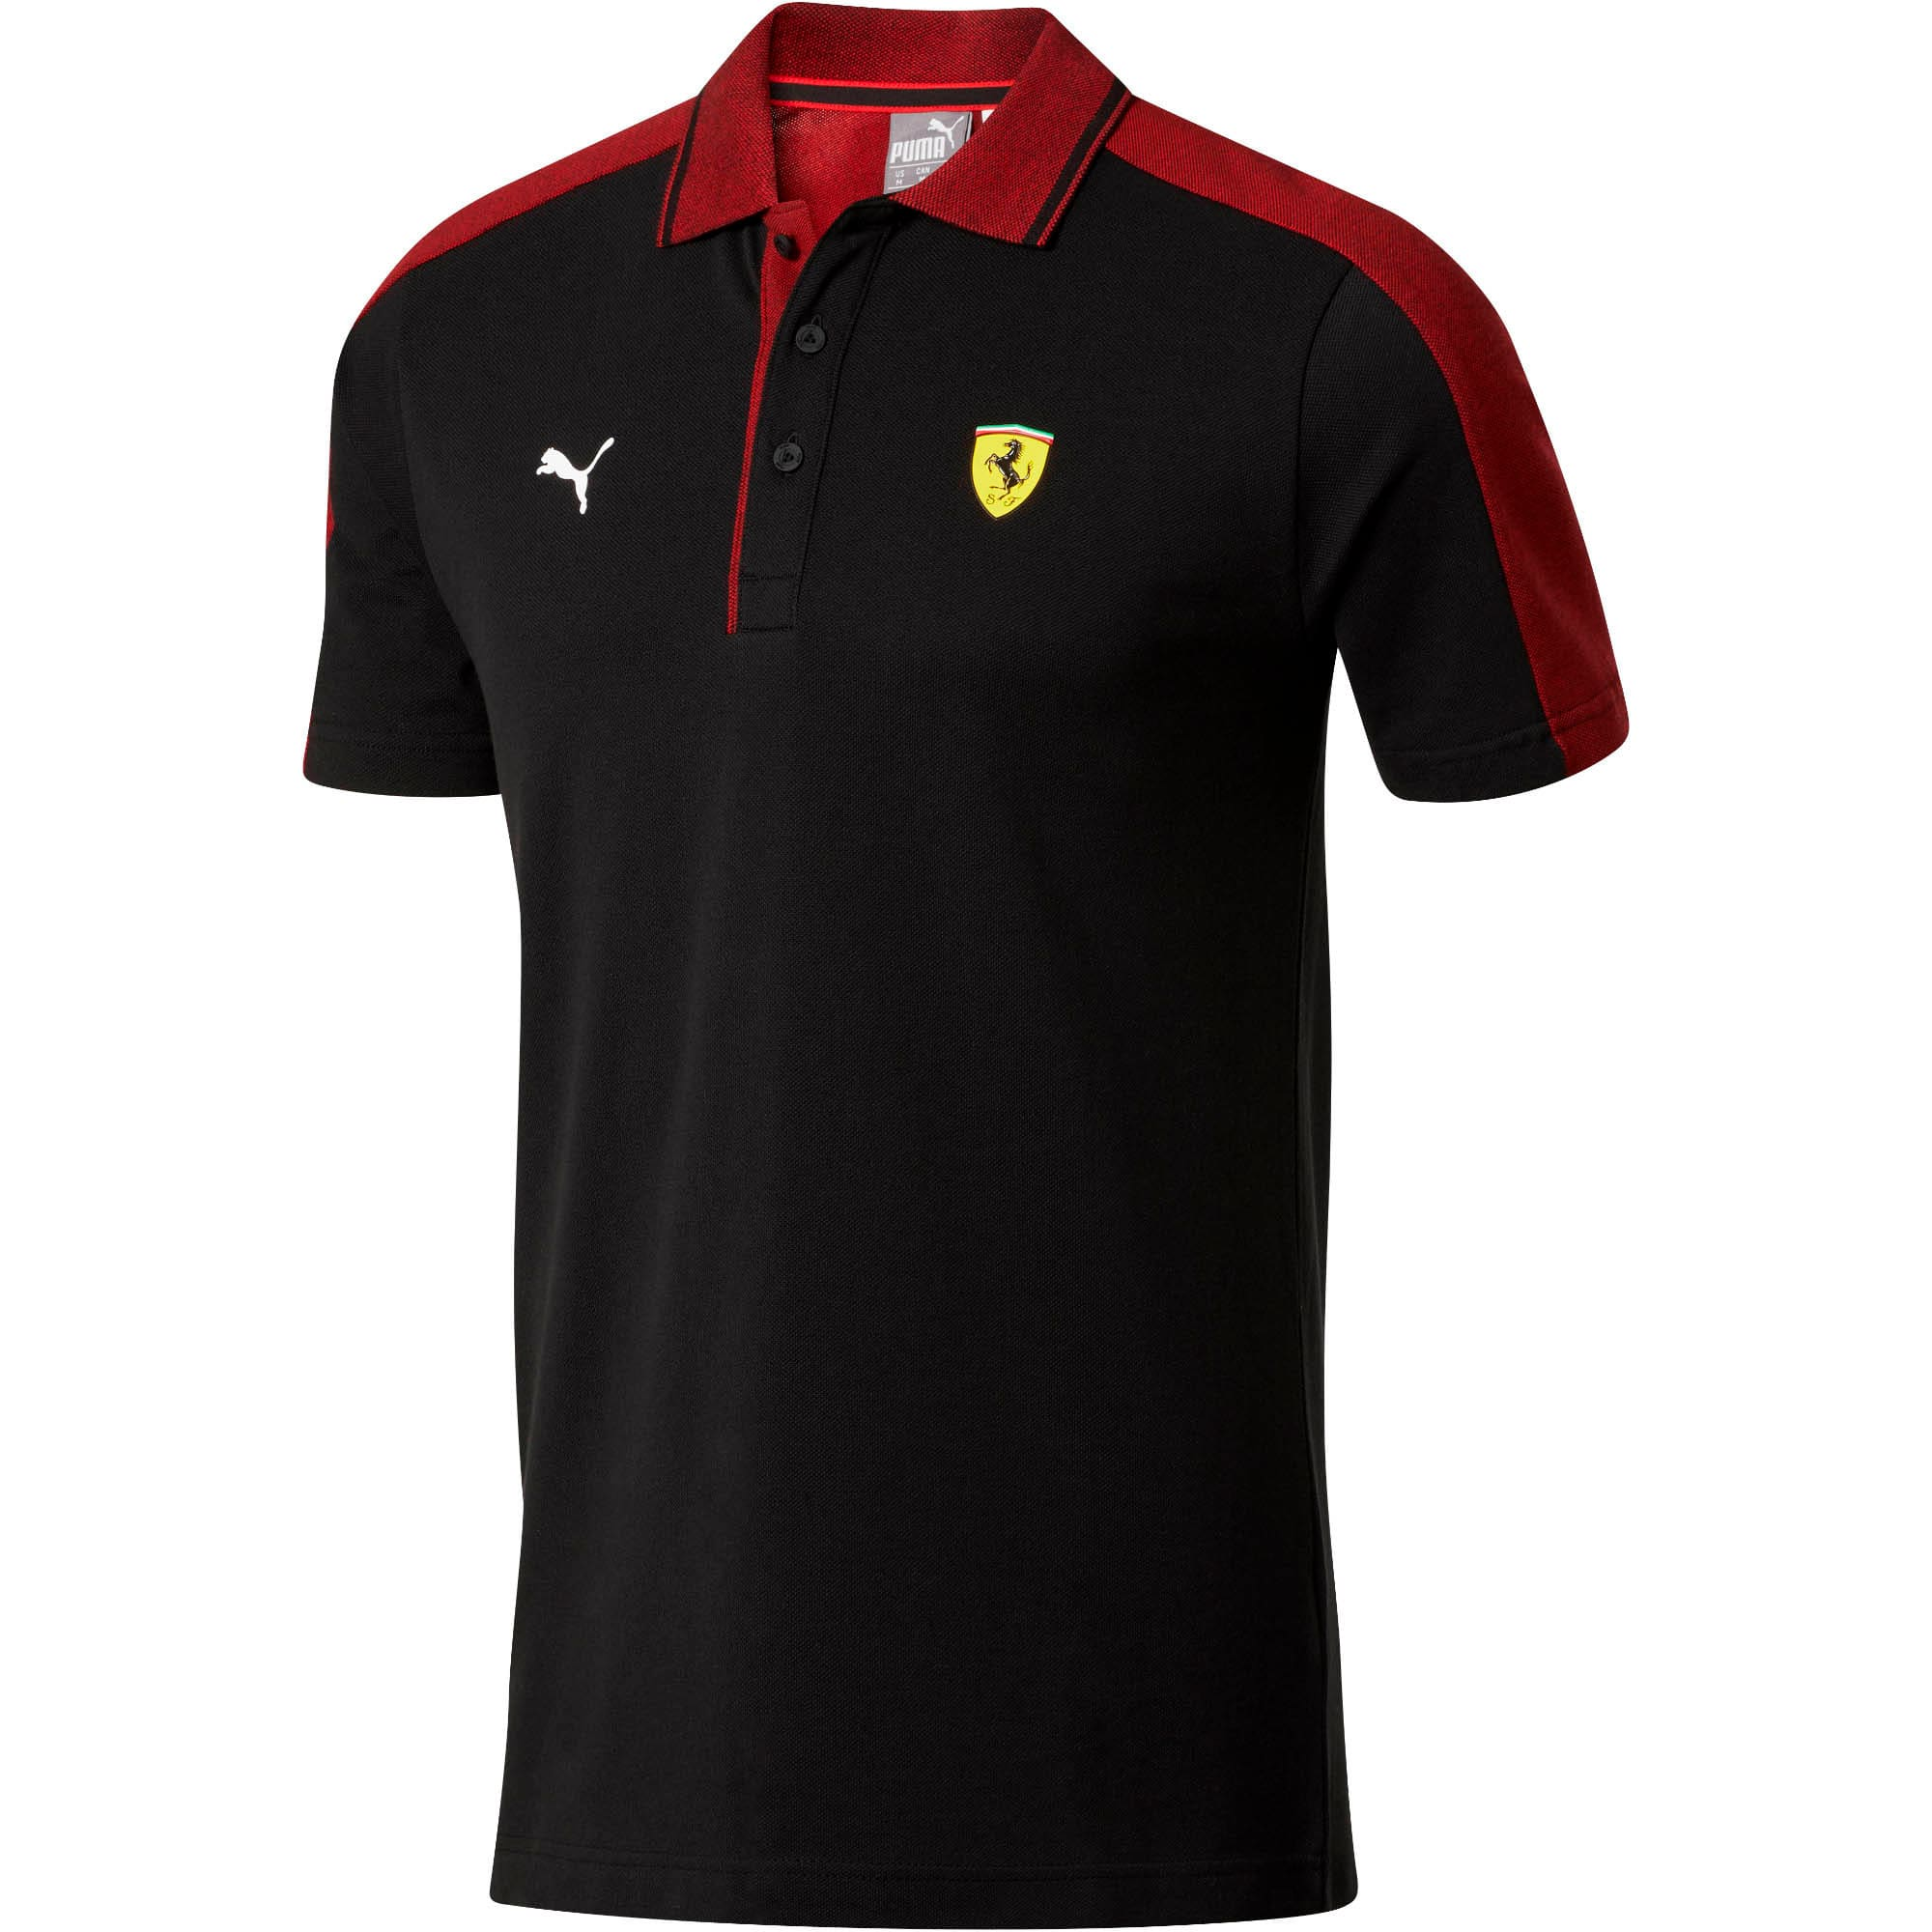 Miniatura 4 de Camiseta tipo polo Scuderia Ferrari Mix para hombre, Puma Black, mediano